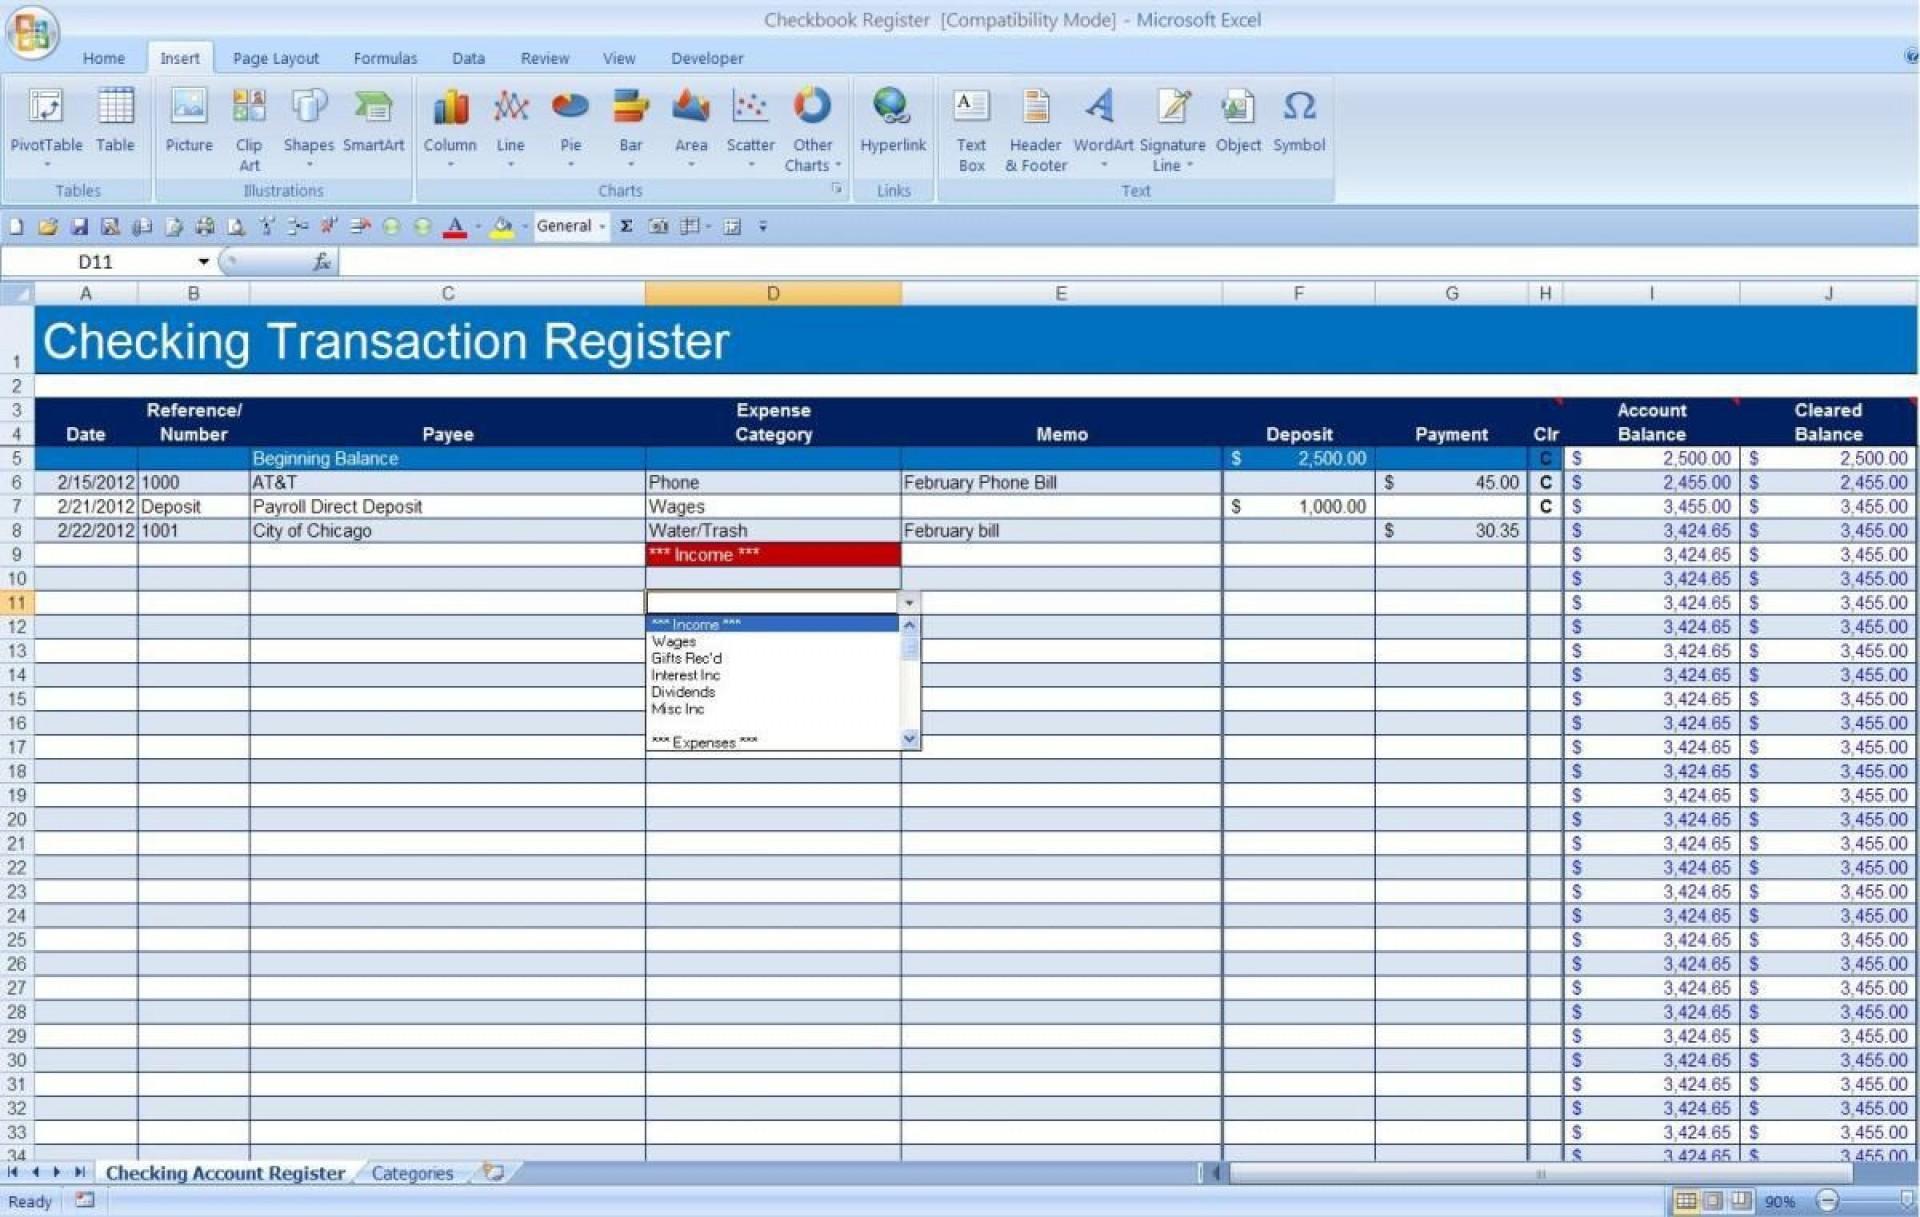 009 Impressive Checkbook Register Template Excel 2013 High Resolution 1920